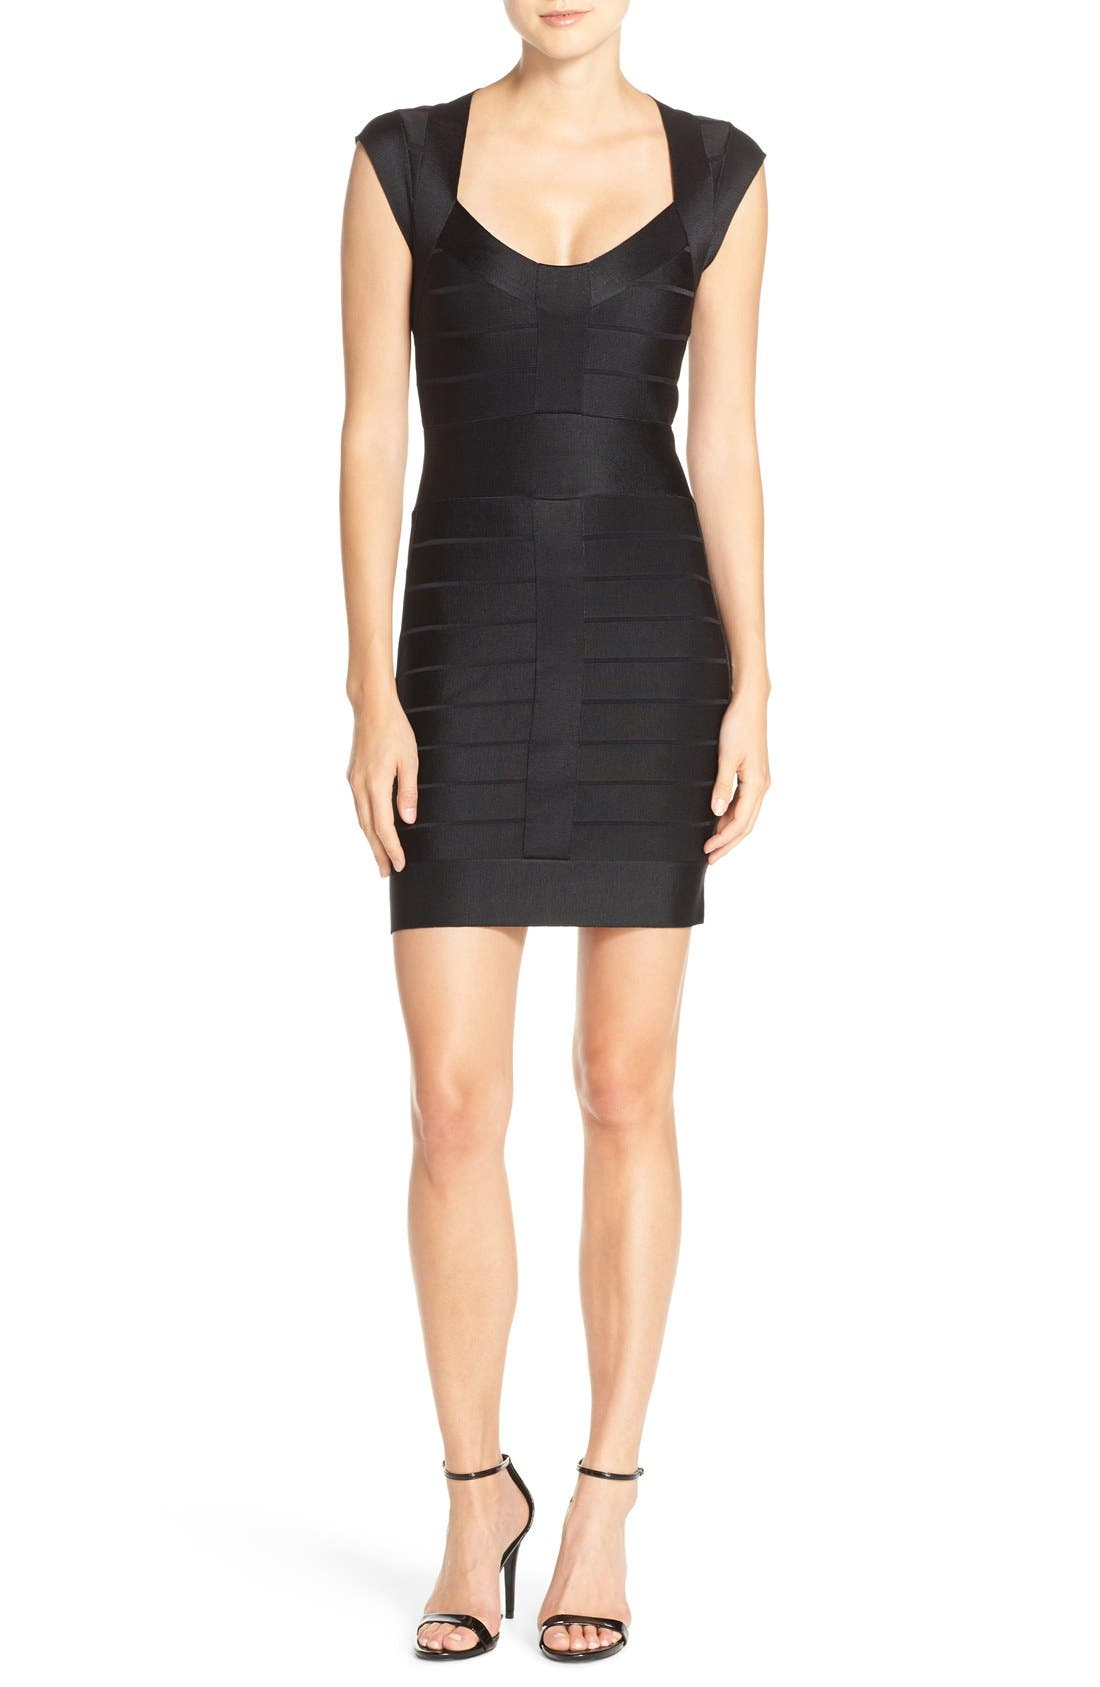 Main Image - French Connection 'Miami Spotlight' Cap Sleeve Bandage Dress